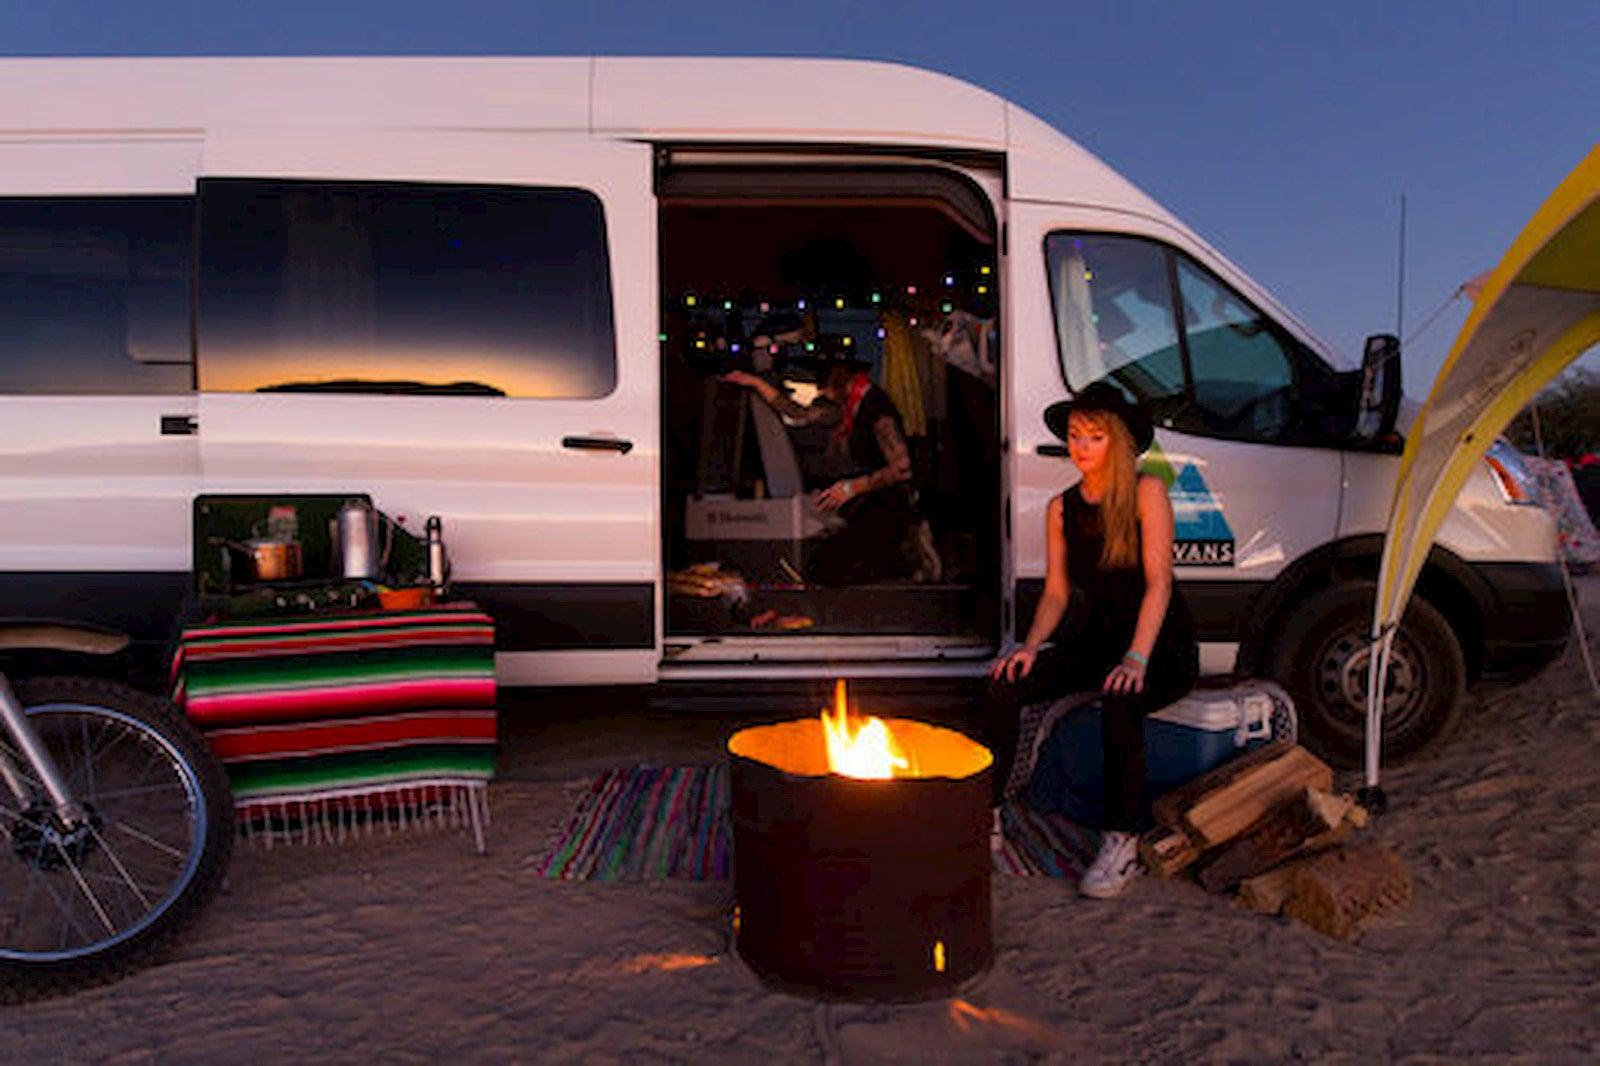 Women sitting in fron of fire pit and sprinter van rental.